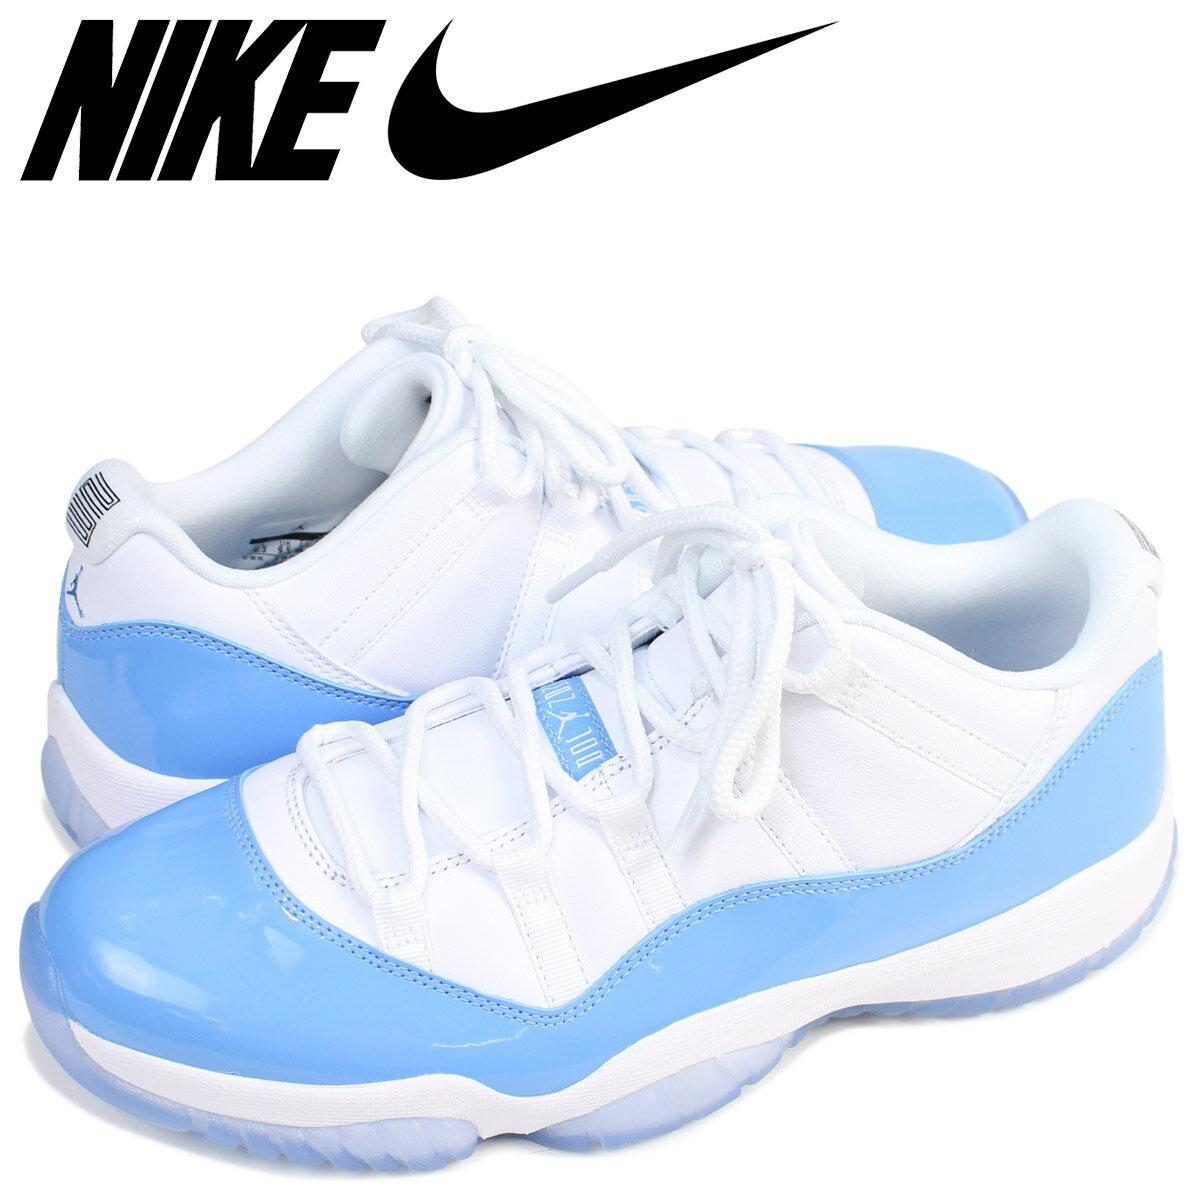 NIKE ナイキ エアジョーダン11 ロー スニーカー  AIR JORDAN 11 LOW UNIVERSITY BLUE  メンズ 528895-106 靴 ホワイト 【◆】